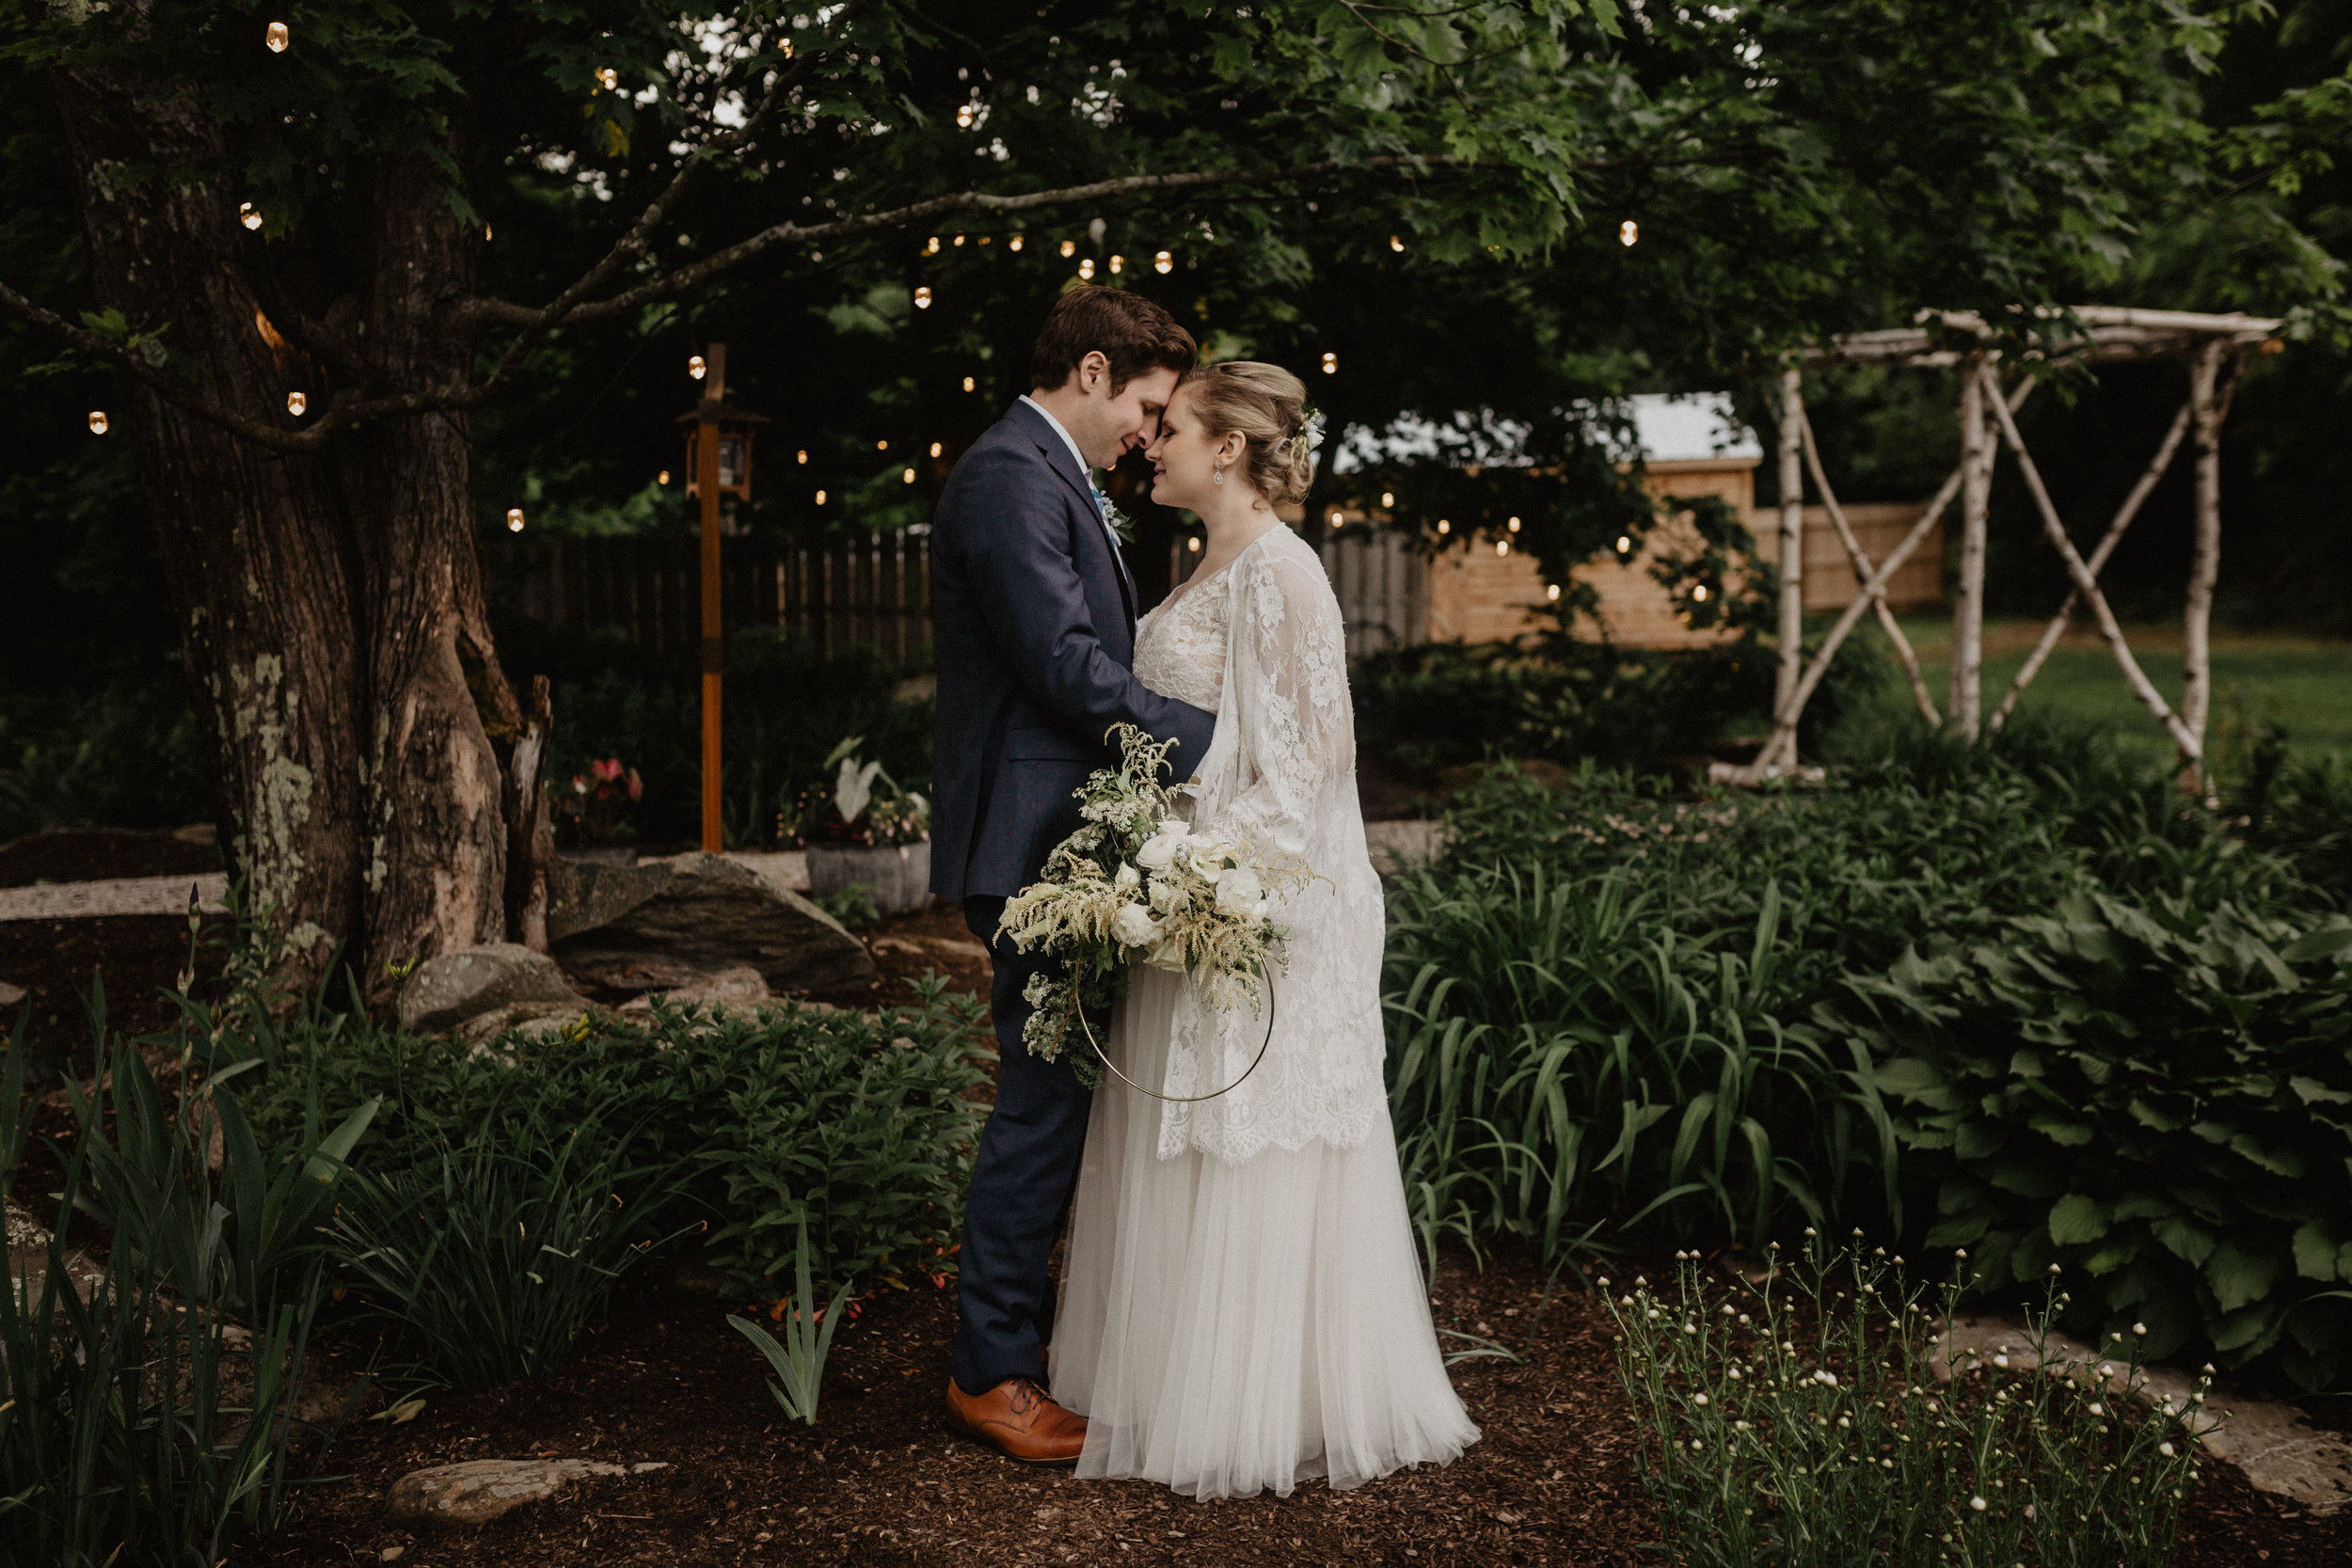 greywacke_meadows_wedding_-121.jpg